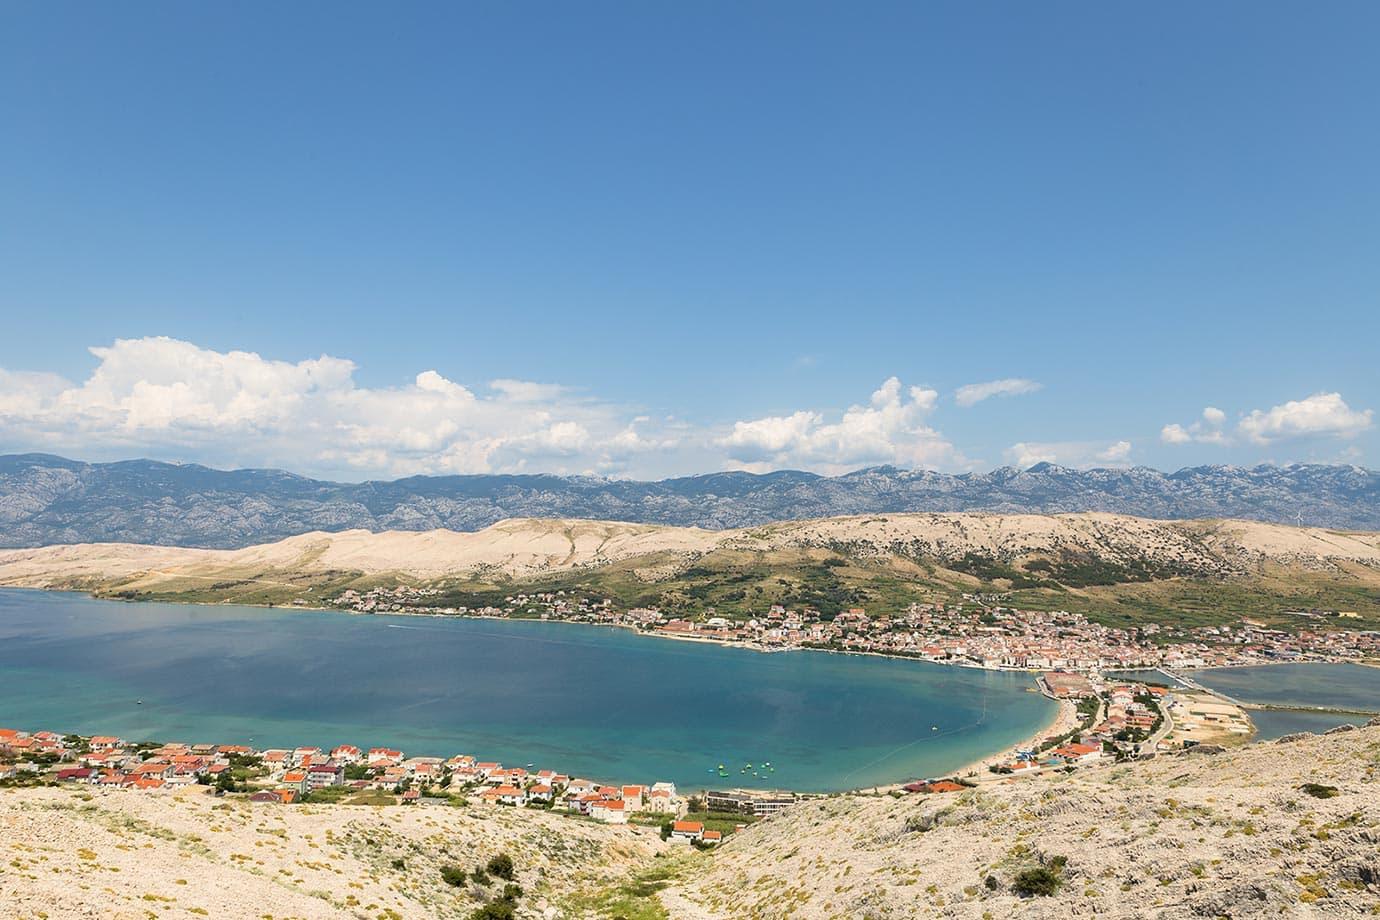 View of Pag, Croatia